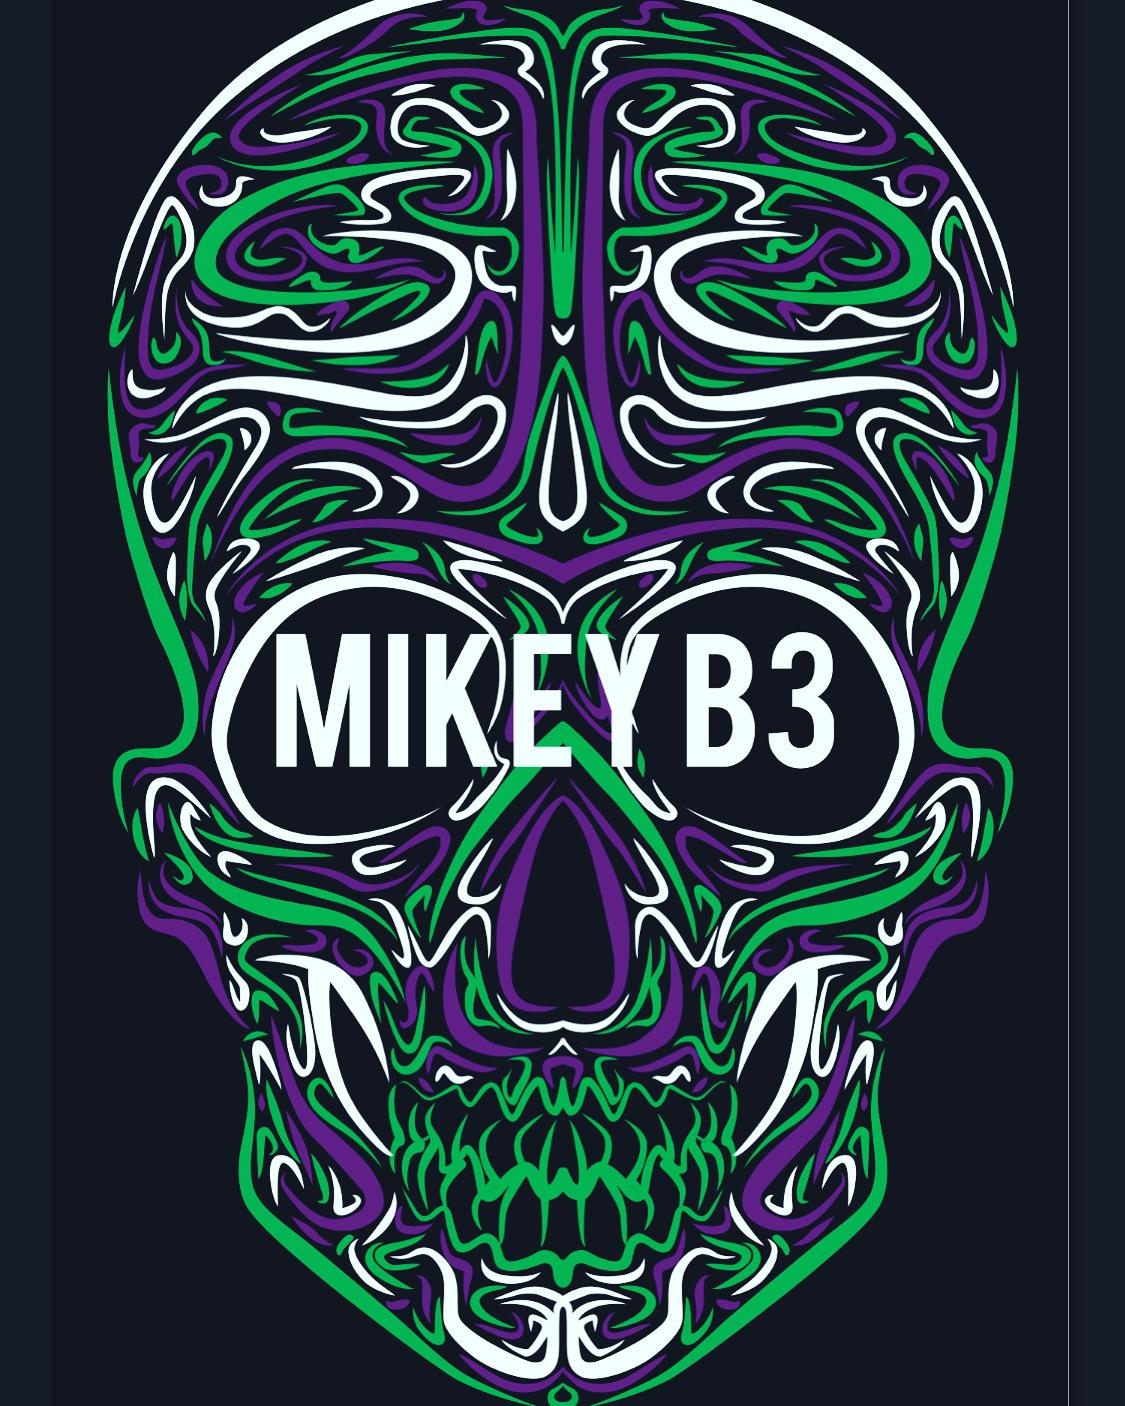 Mikey B3 IMG-1409.JPG